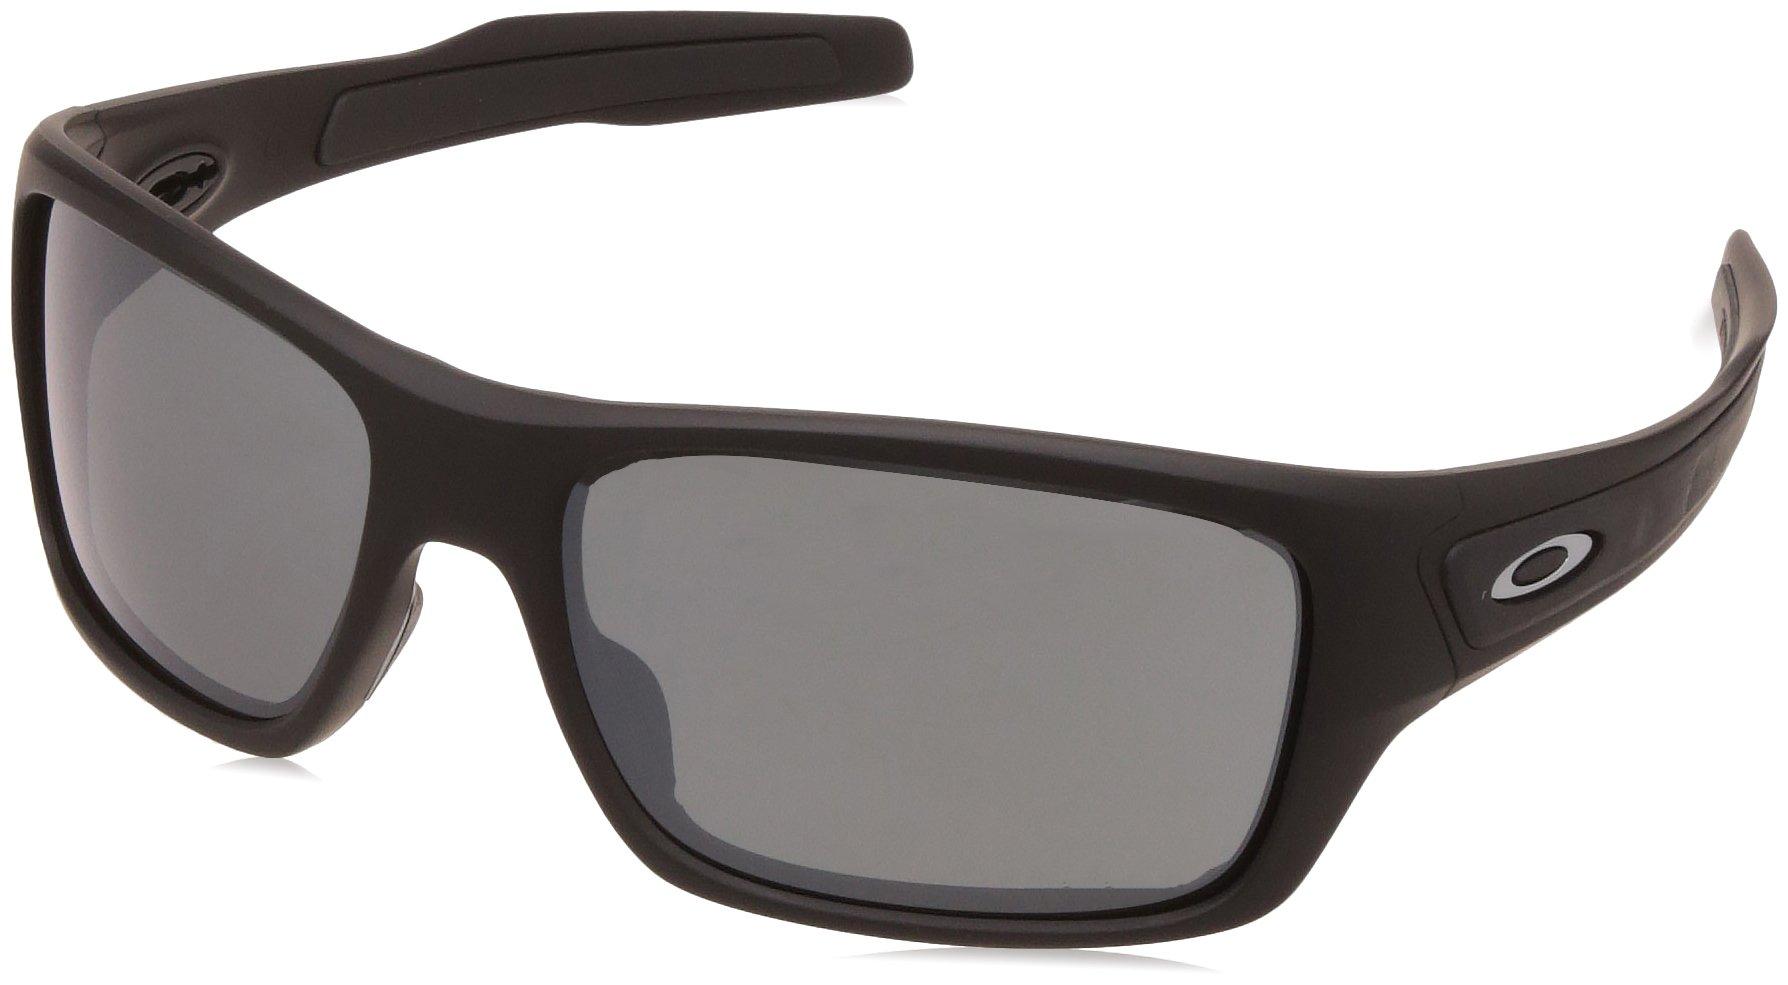 Oakley Men's OO9263 Turbine Rectangular Sunglasses, Matte Black/Prizm Black, 65 mm